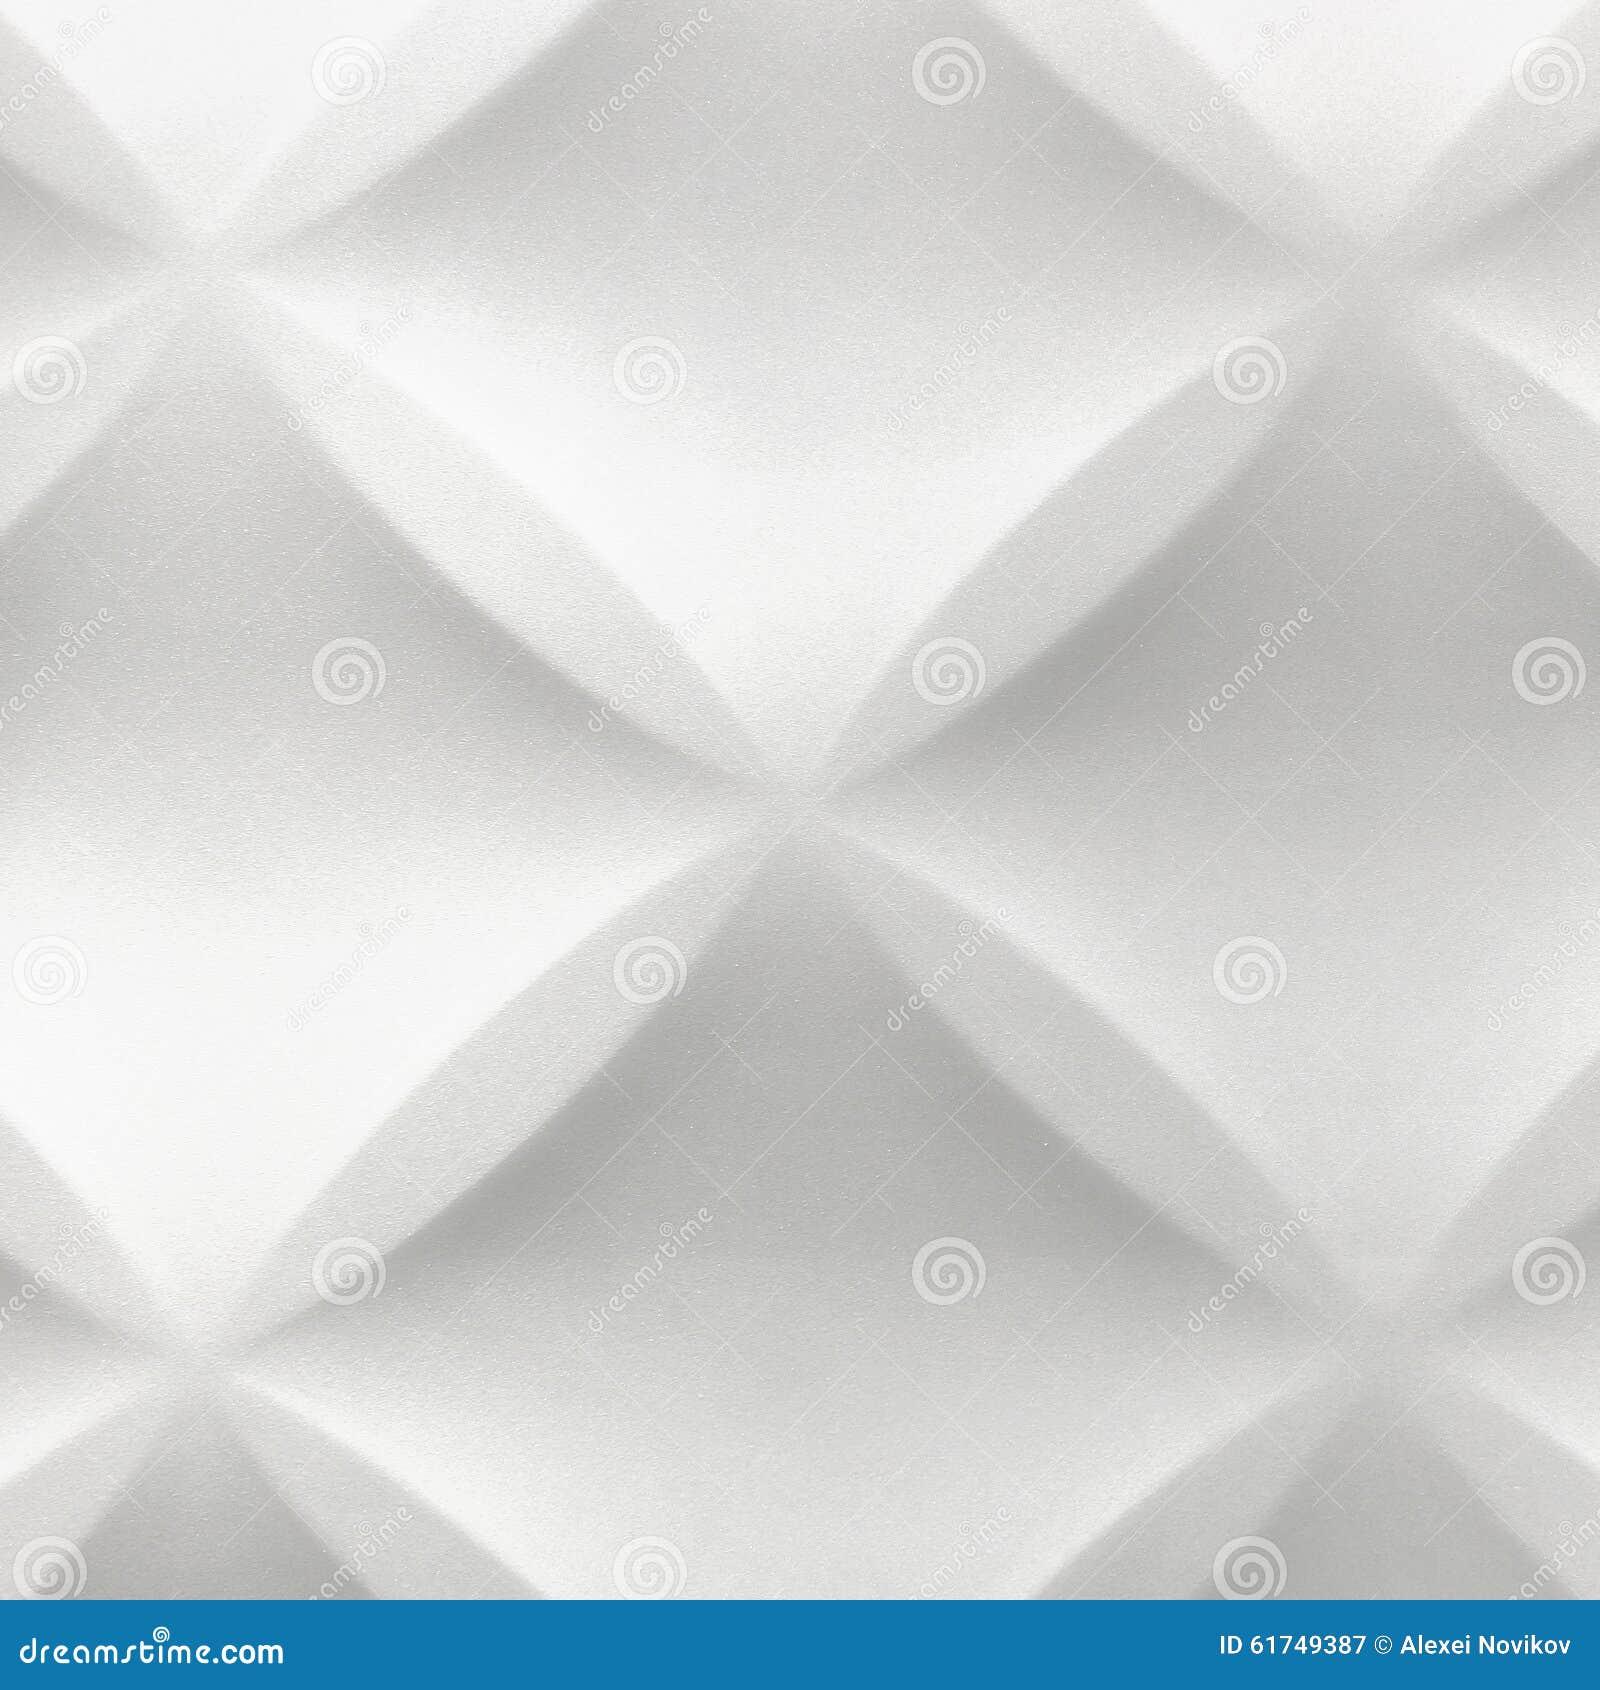 Designer White Abstract Ceramic Wall Tile Pack Of 8 L: White Abstract 3D Modern Home Interior Polystyrene Tile